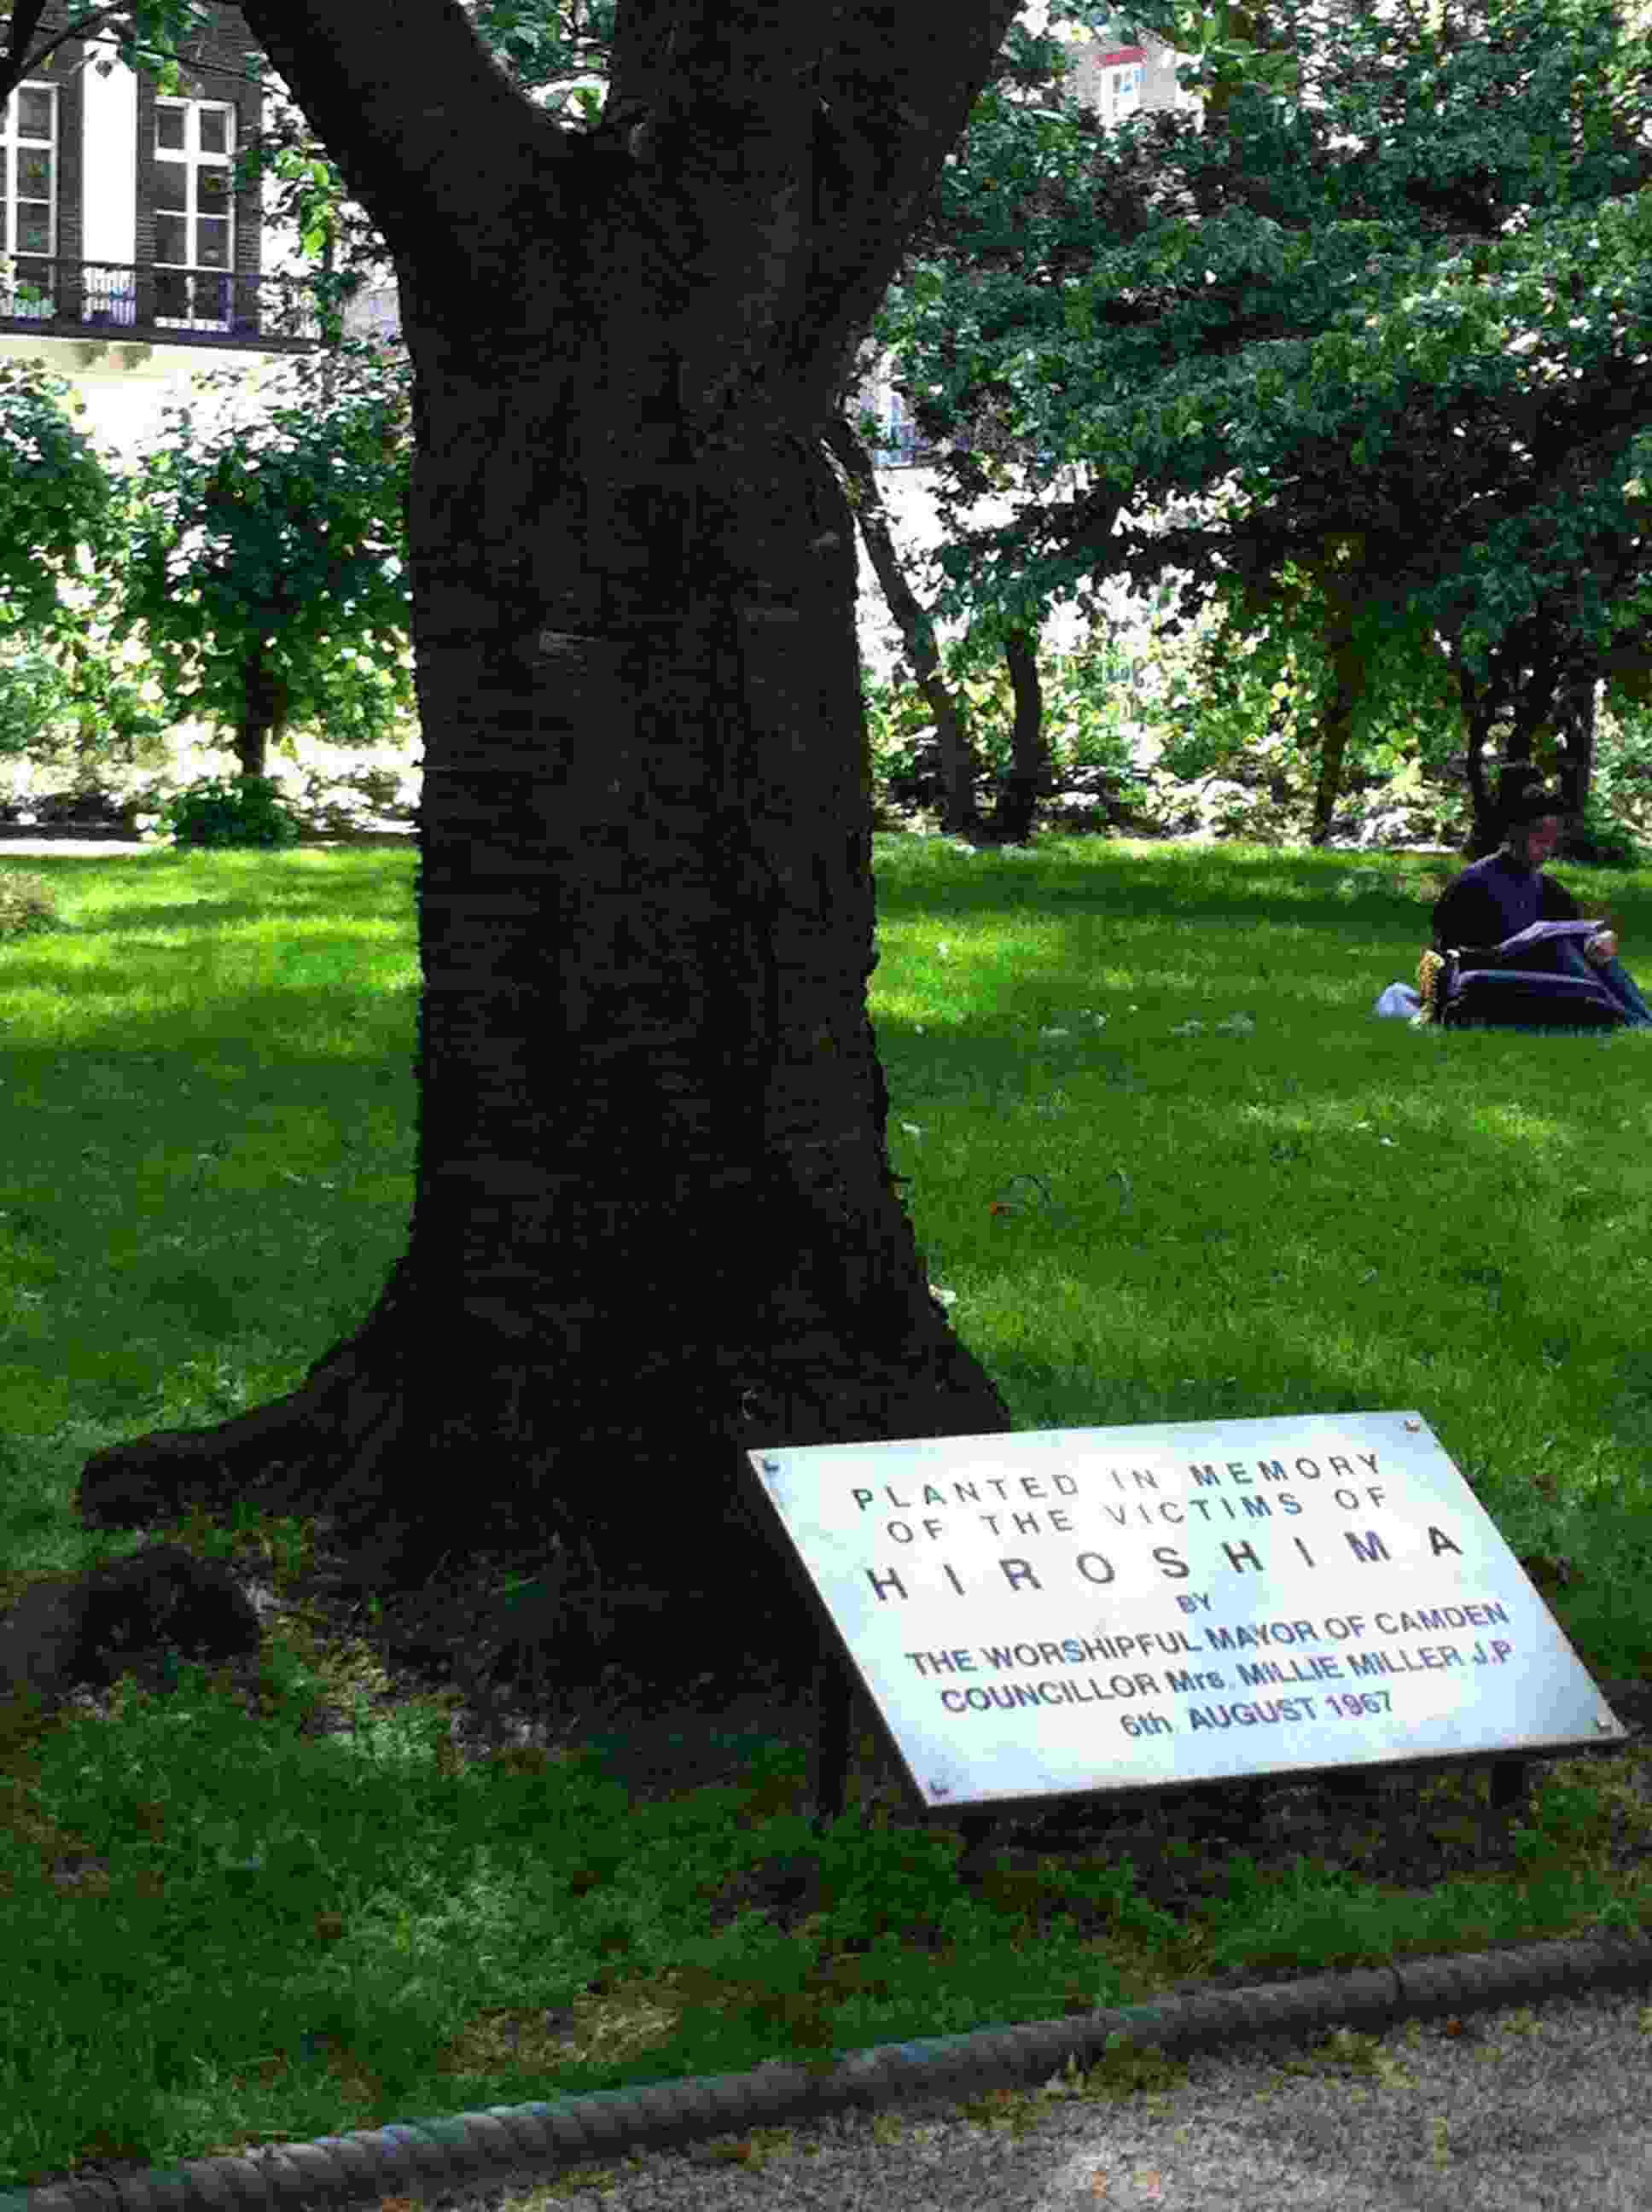 Hiroshima Tree at Tavistock Square, London. Photo © Global Poetry.